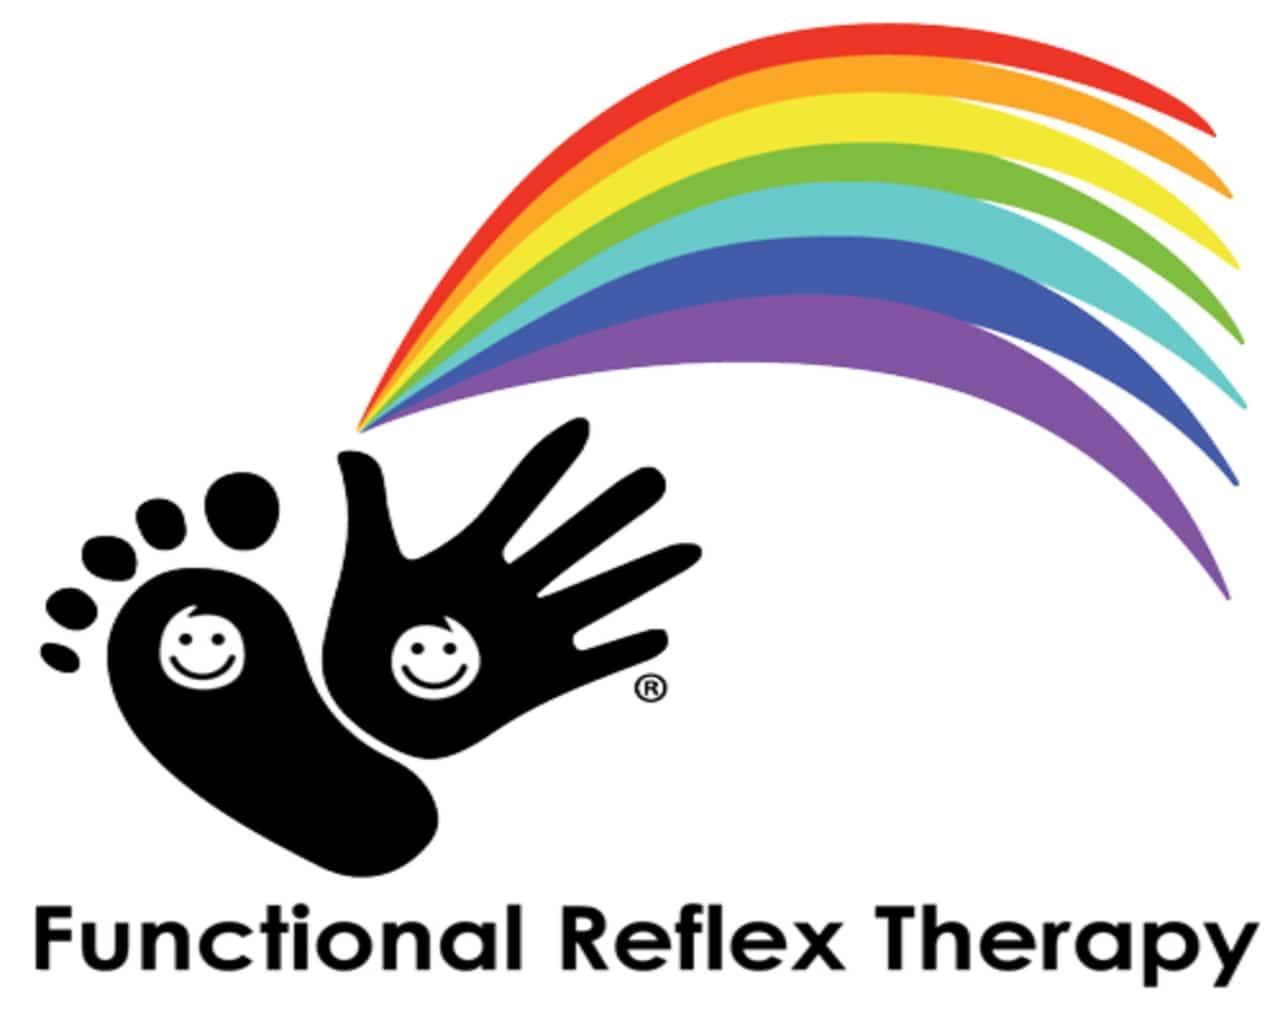 functionalreflex